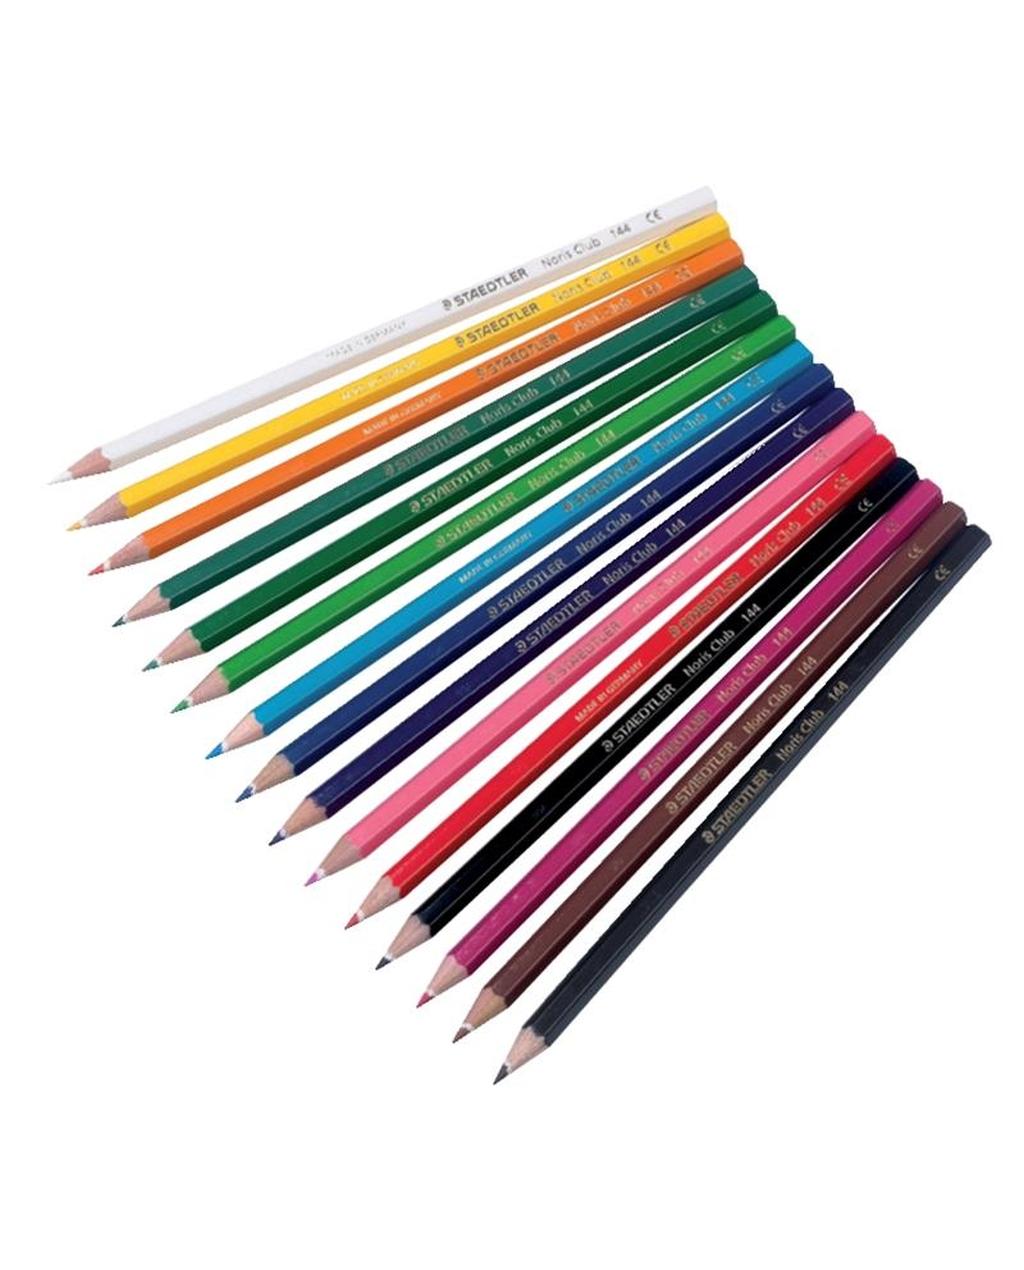 Staedtler Noris Colour Colouring Pencils - Yellow